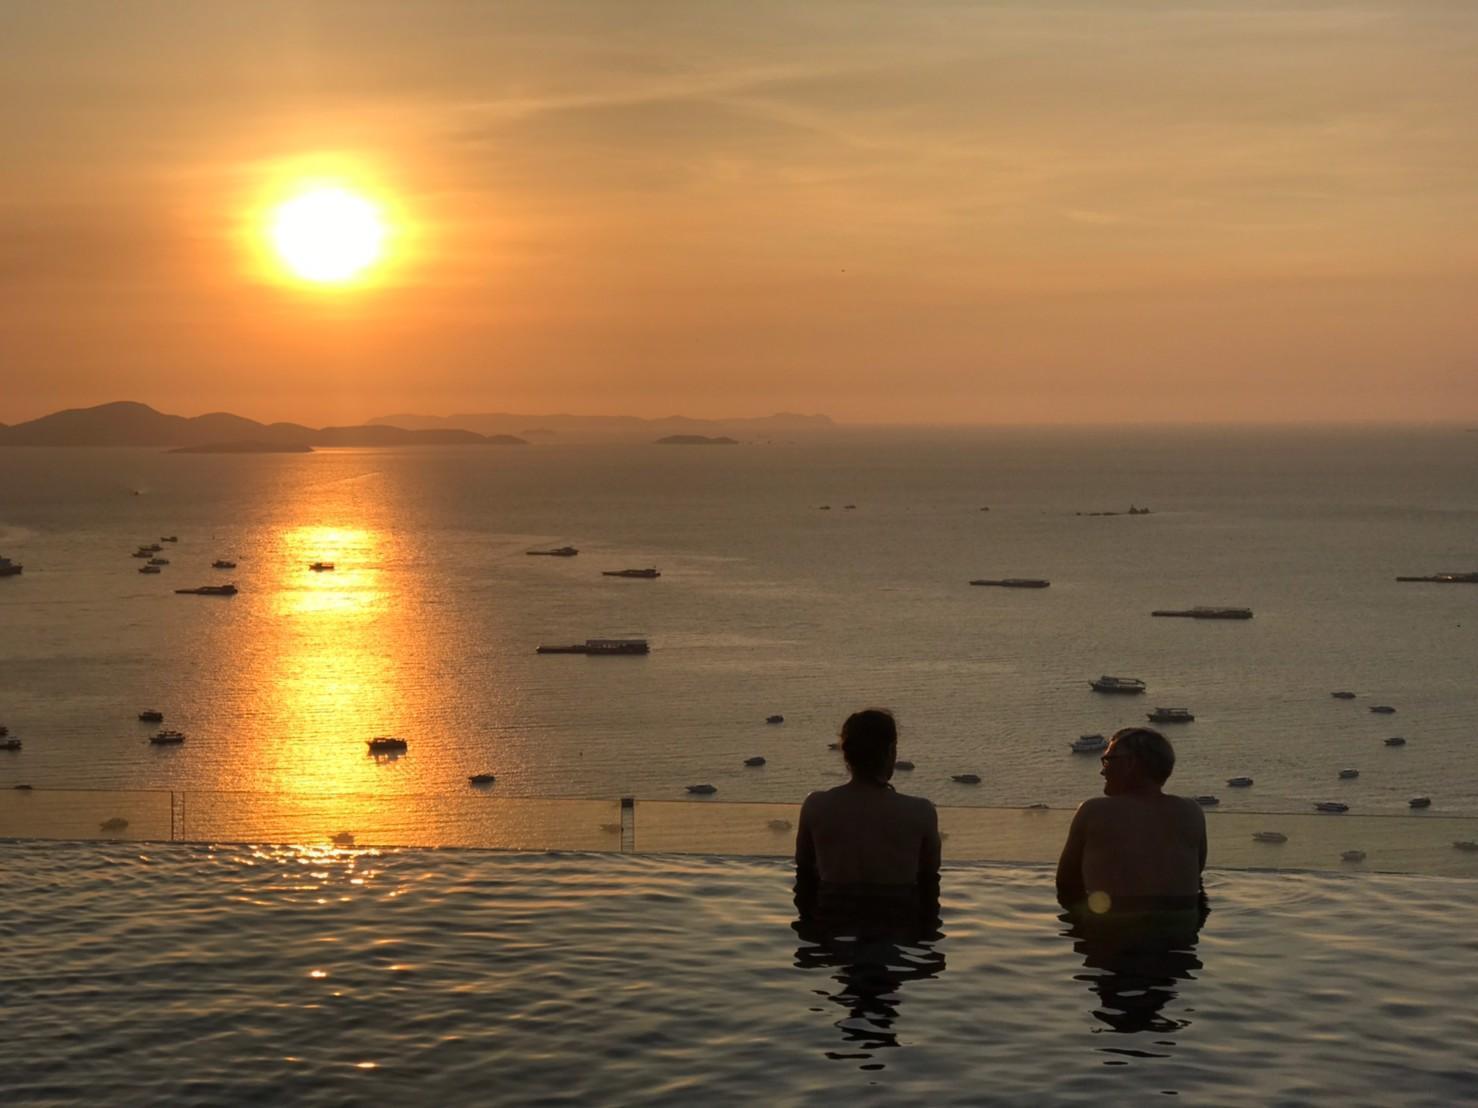 Centric Sea Pattaya Sea View Pools 1 BR อพาร์ตเมนต์ 1 ห้องนอน 1 ห้องน้ำส่วนตัว ขนาด 35 ตร.ม. – พัทยากลาง